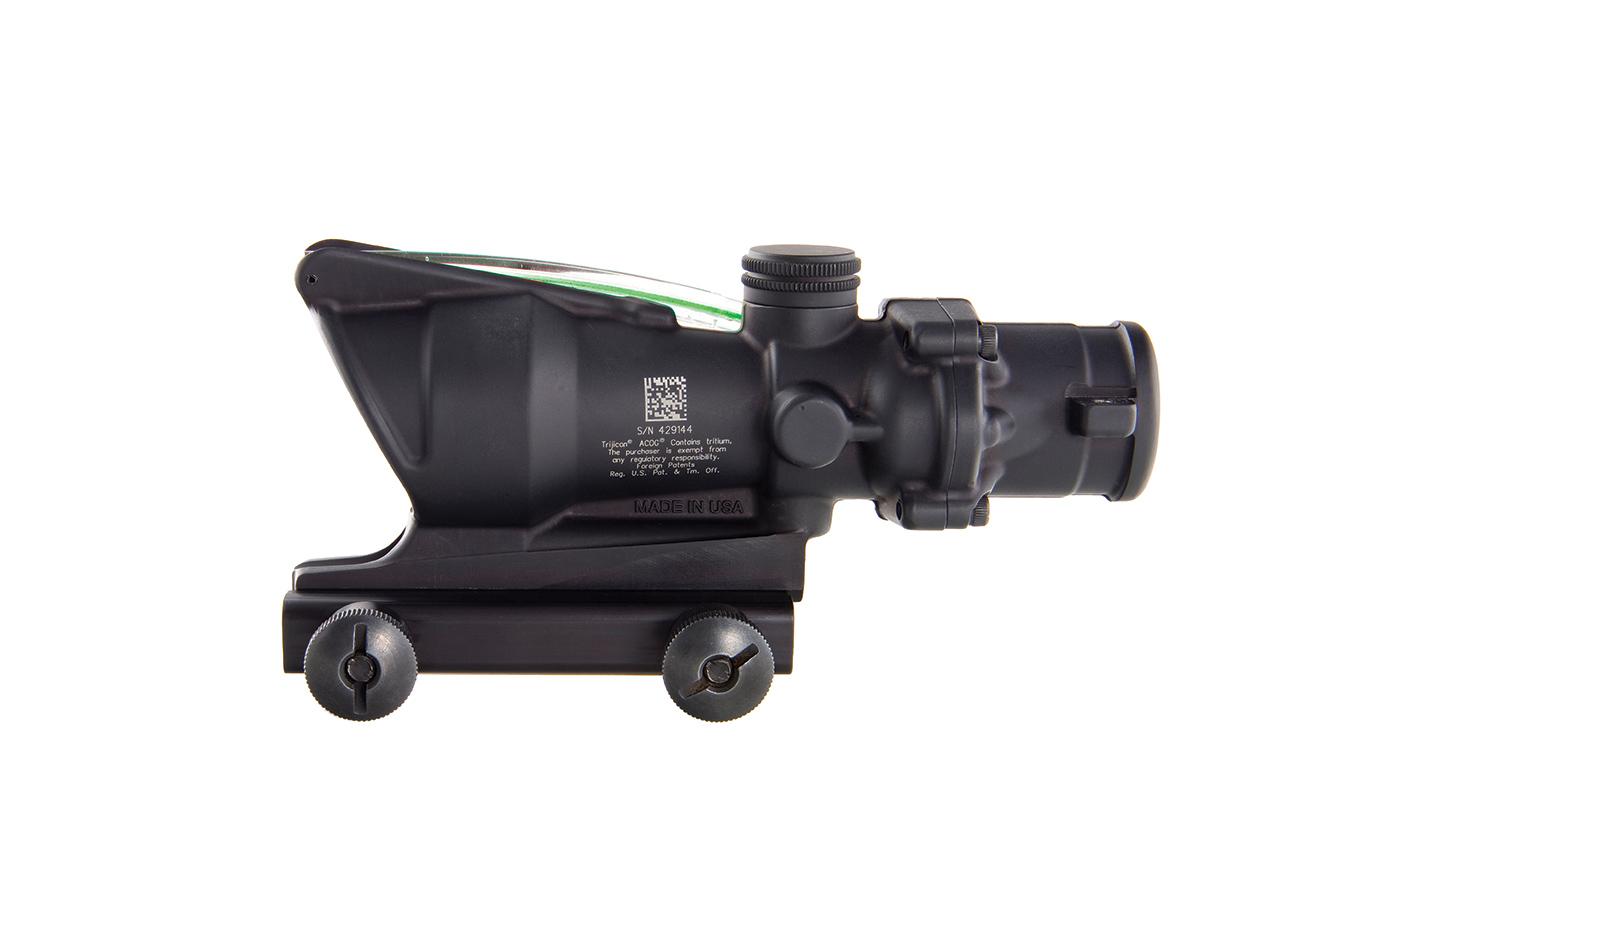 TA31-D-100290 angle 2